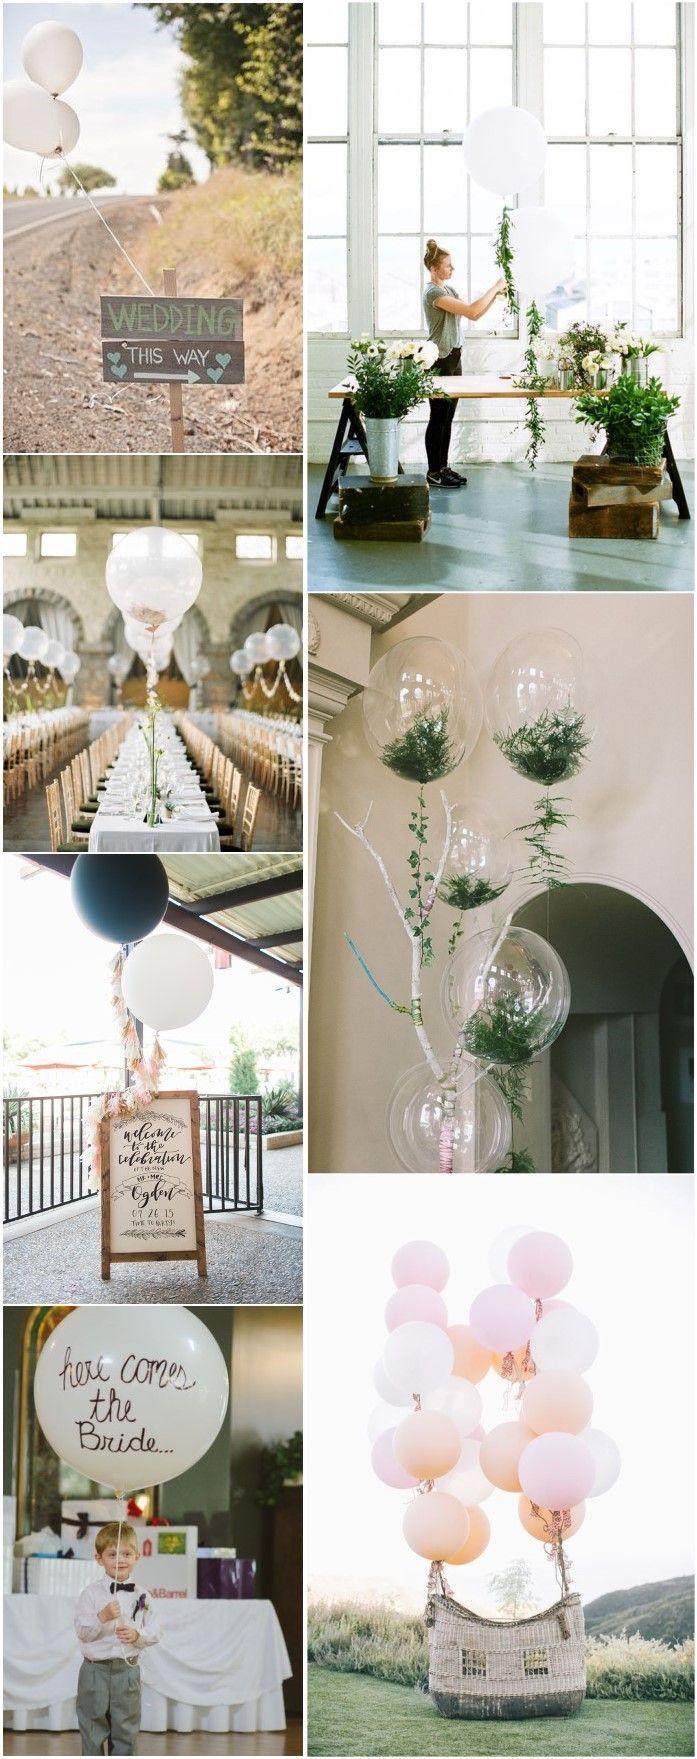 Wedding decoration ideas balloons   Fun and Creative Balloon Wedding Decoration Ideas  Pinterest